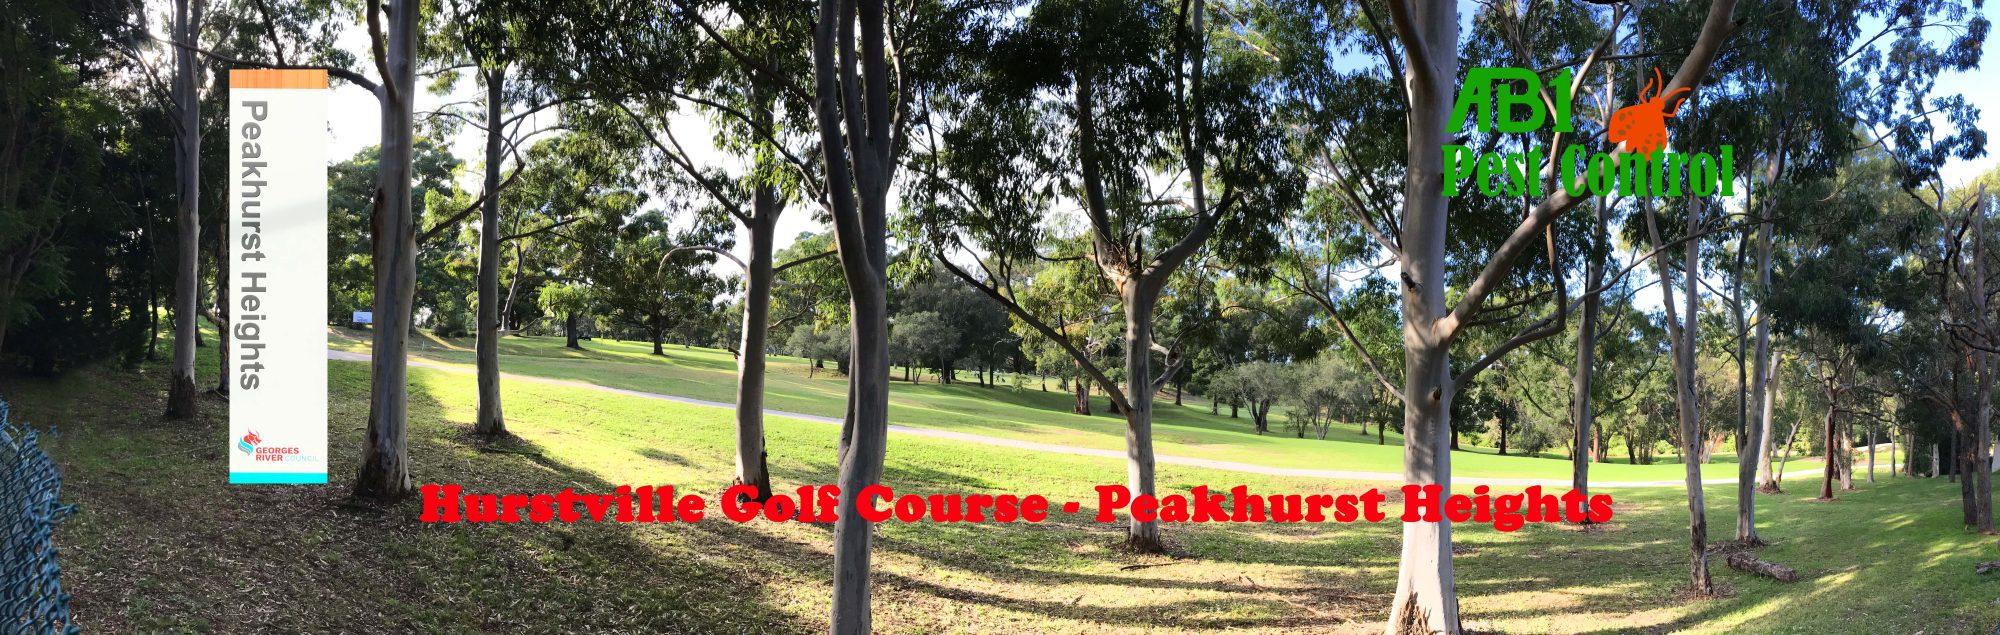 Hurstville Golf Course Peakhurst Heights